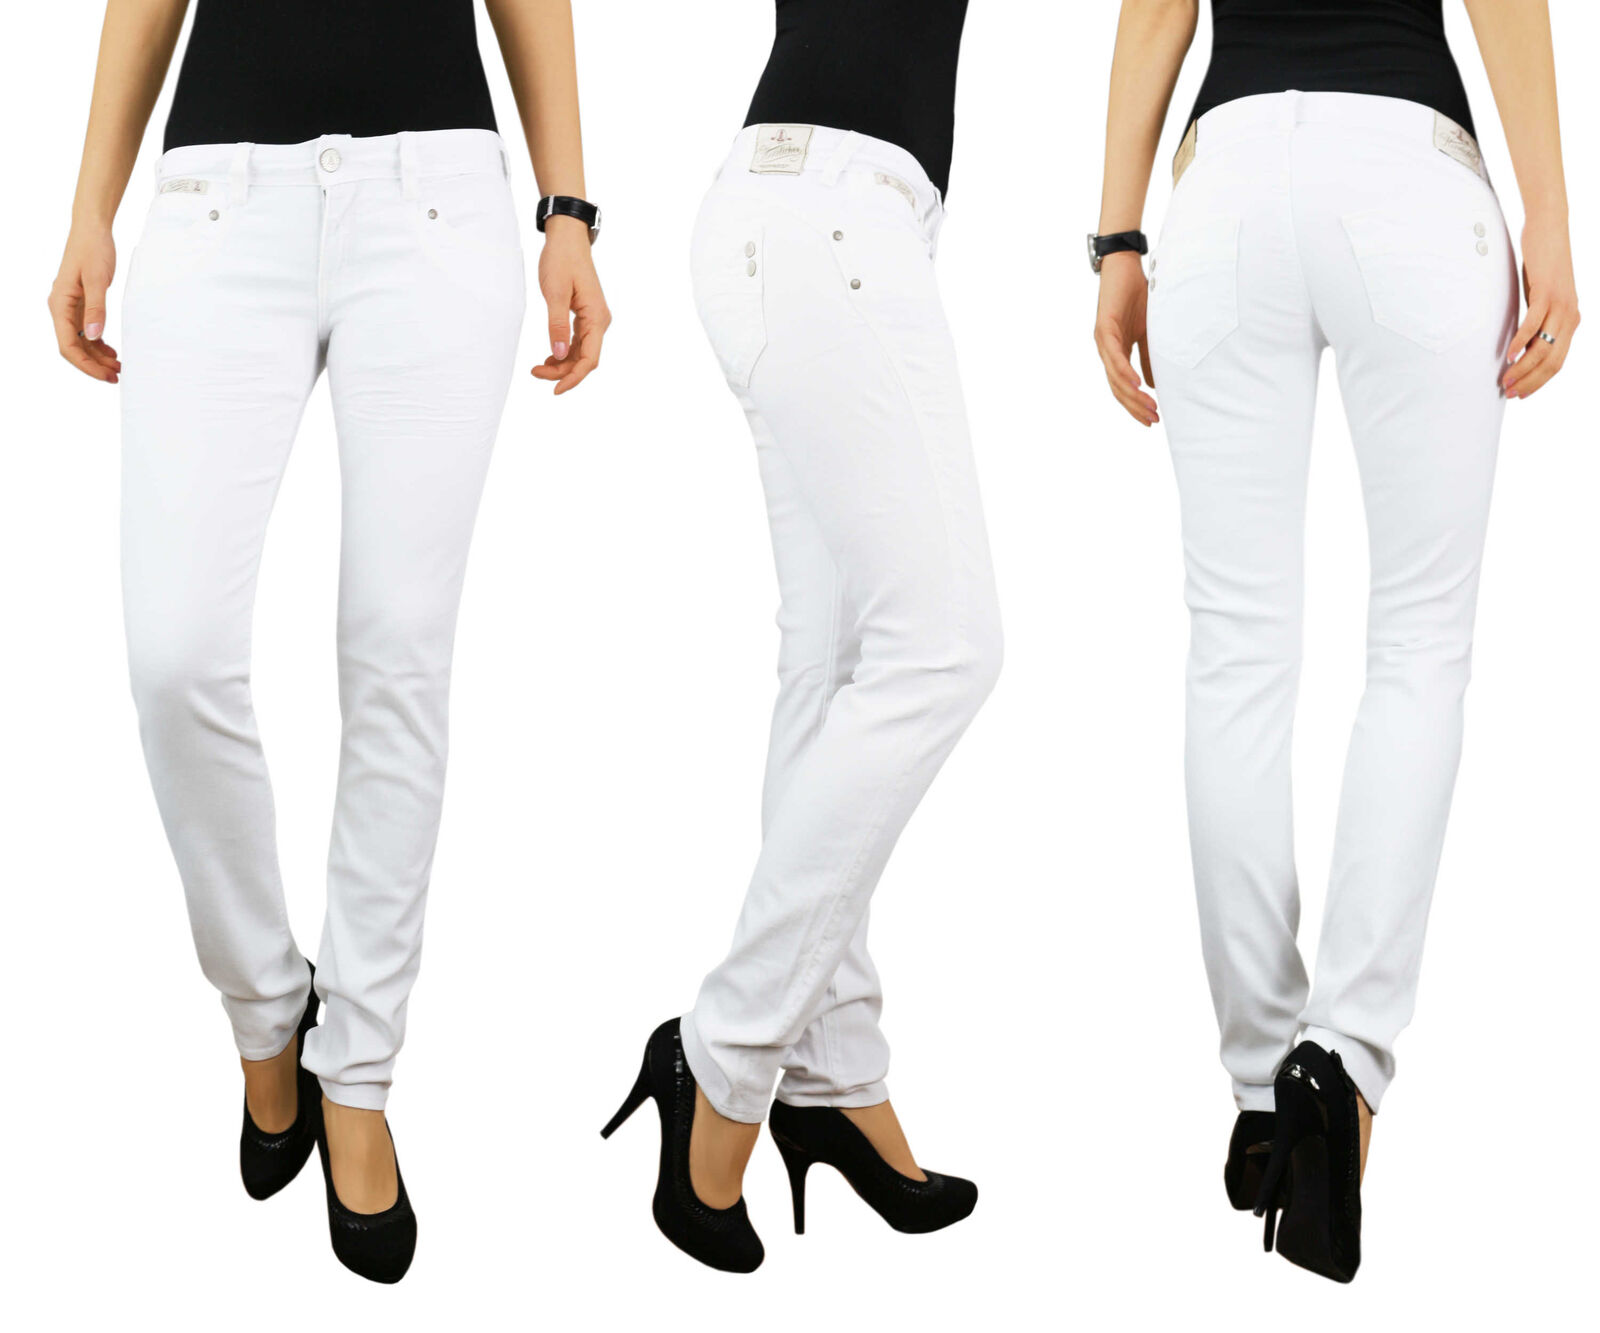 HERRLICHER Damen Hüft Jeans Hose PIPER SLIM 5650 SN560 100 Weiß Drill Stretch